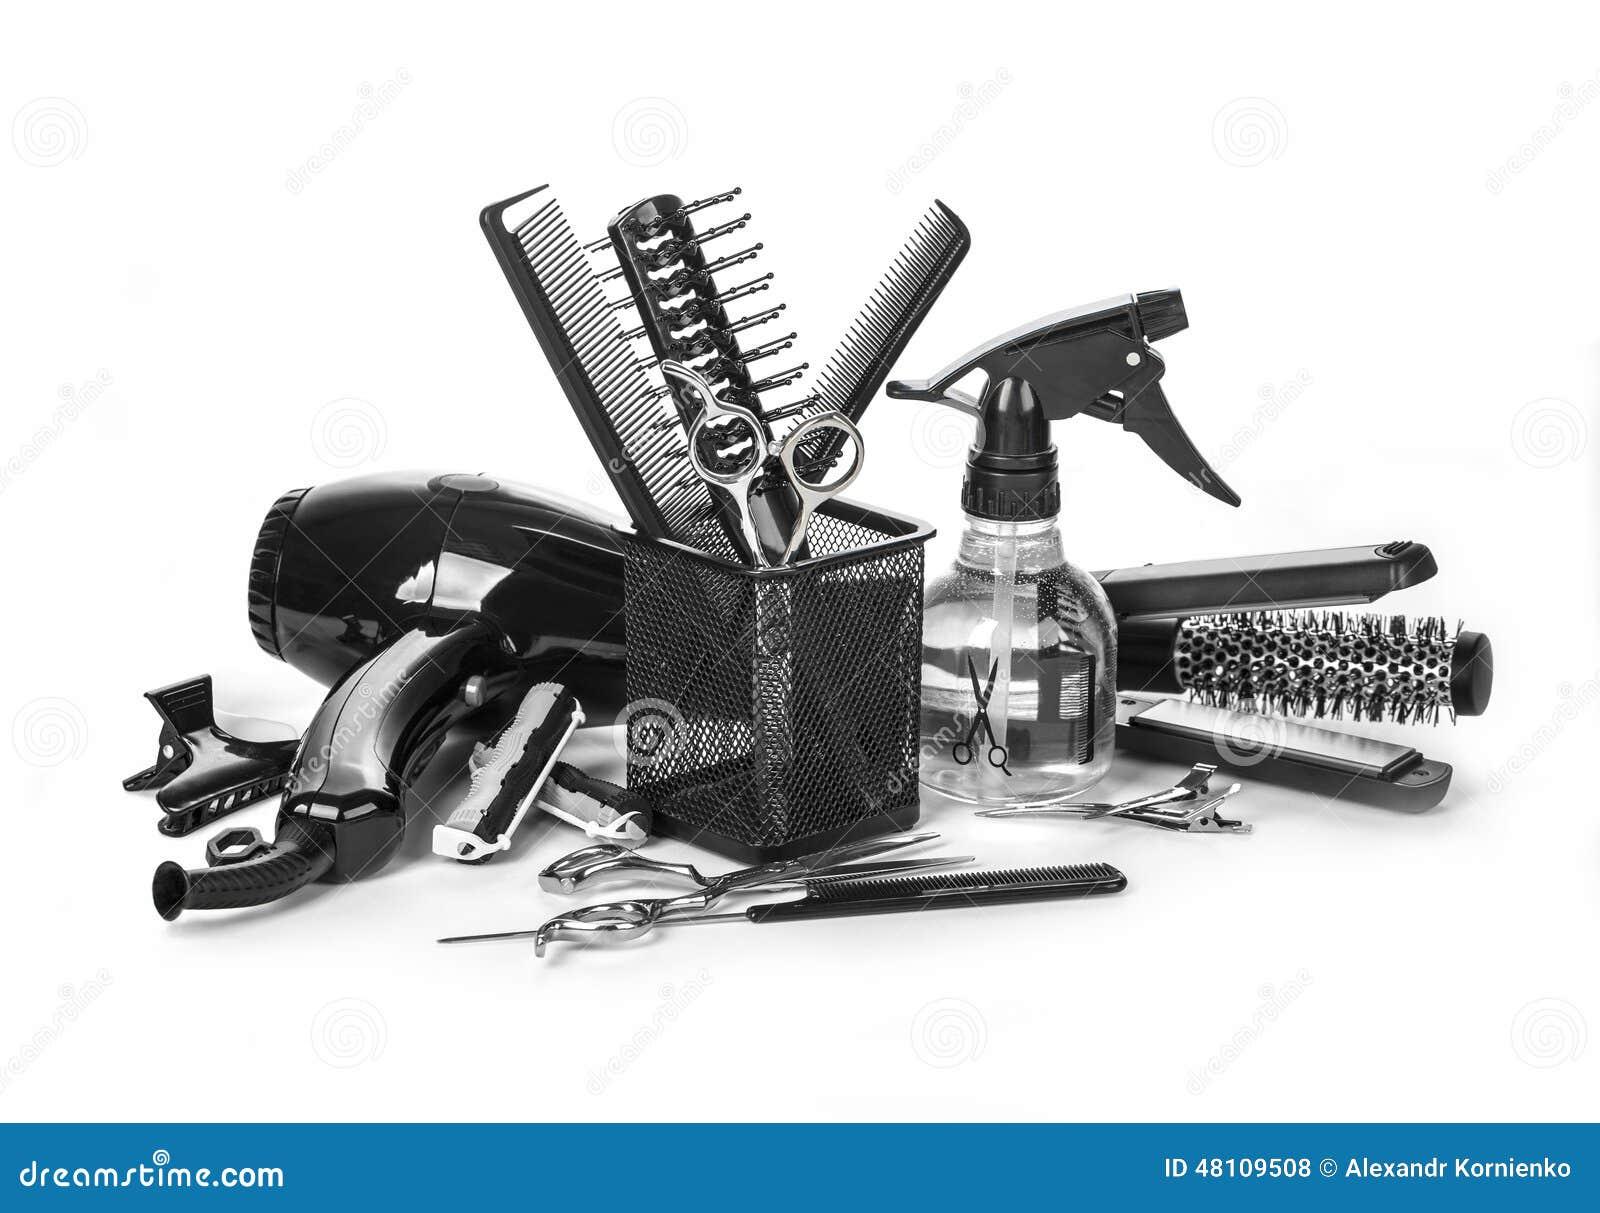 Hairdressing Tools Stock Photo - Image: 48109508